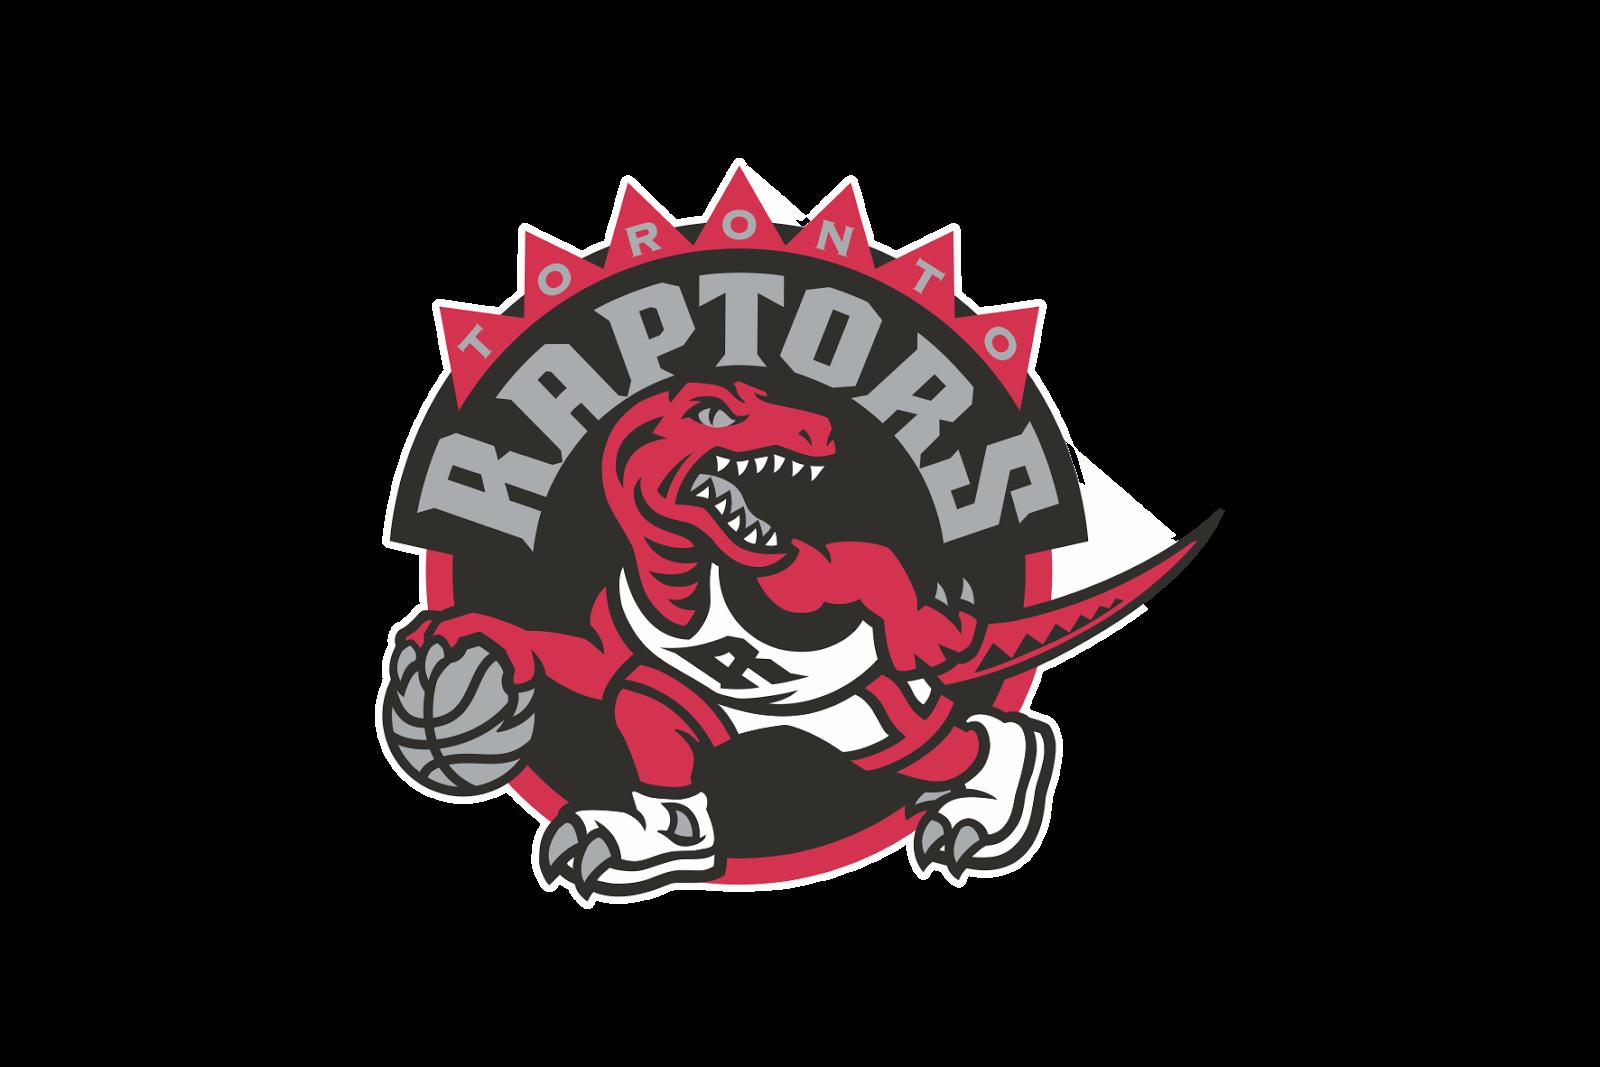 Toronto Raptors Logo Logo Share Raptors Basketball Toronto Raptors Basketball Toronto Raptors